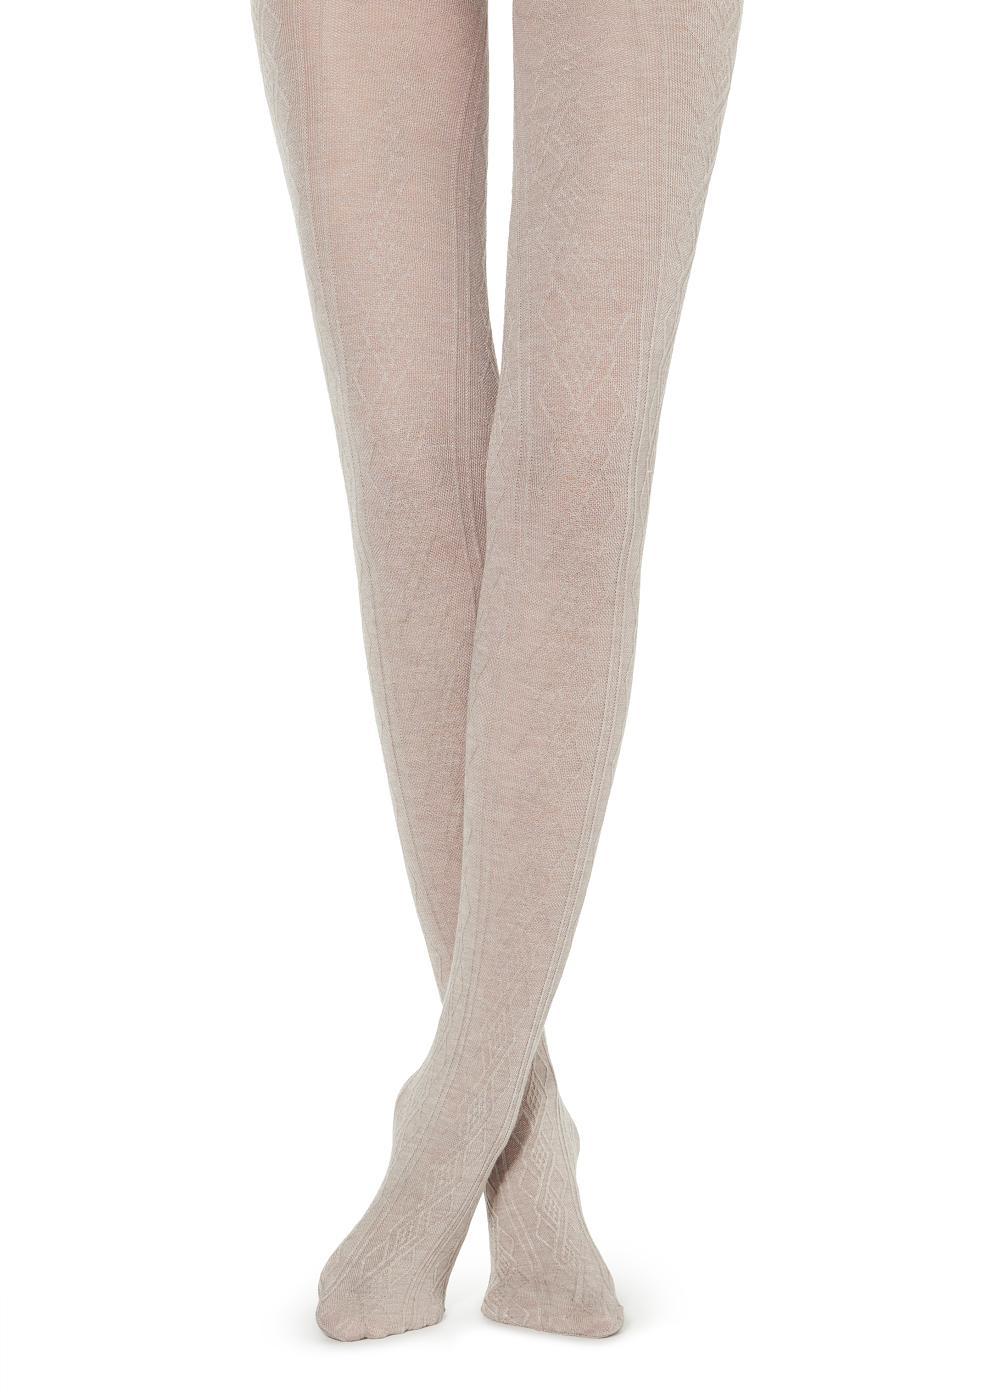 Gerippte Damenstrumpfhose aus Cashmere